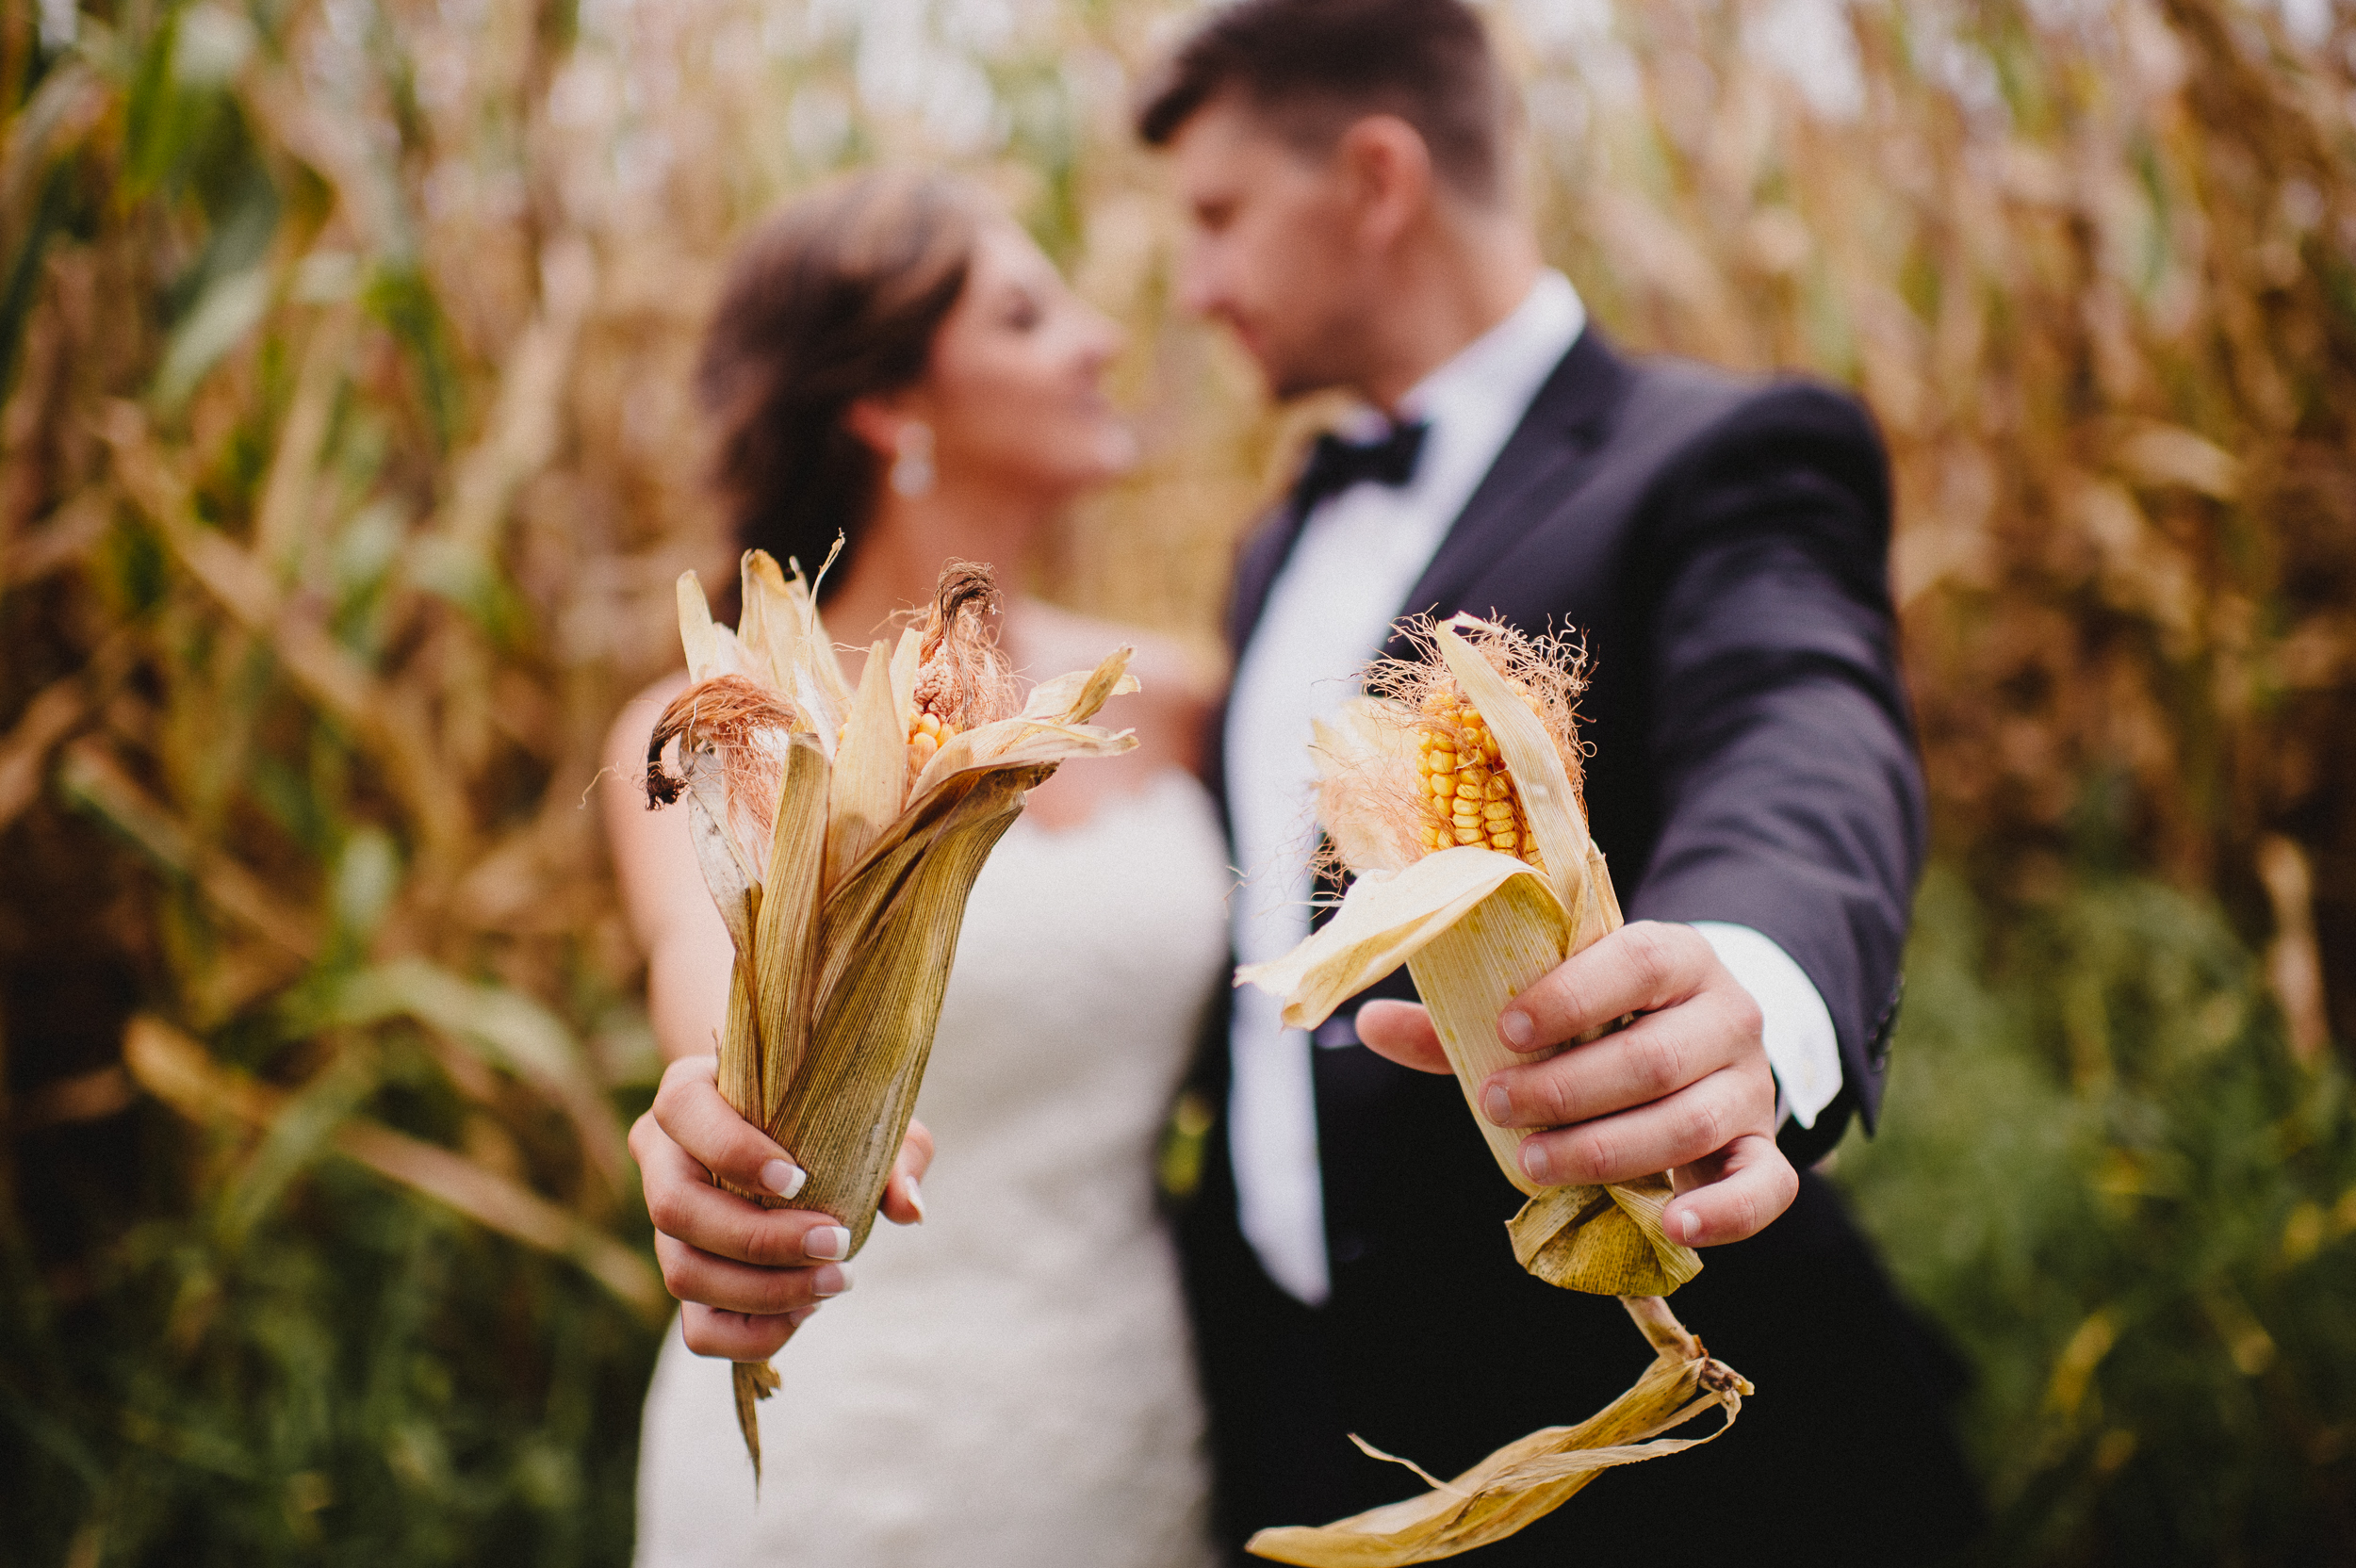 delaware-estate-wedding-photographer-pat-robinson-photography-63.jpg